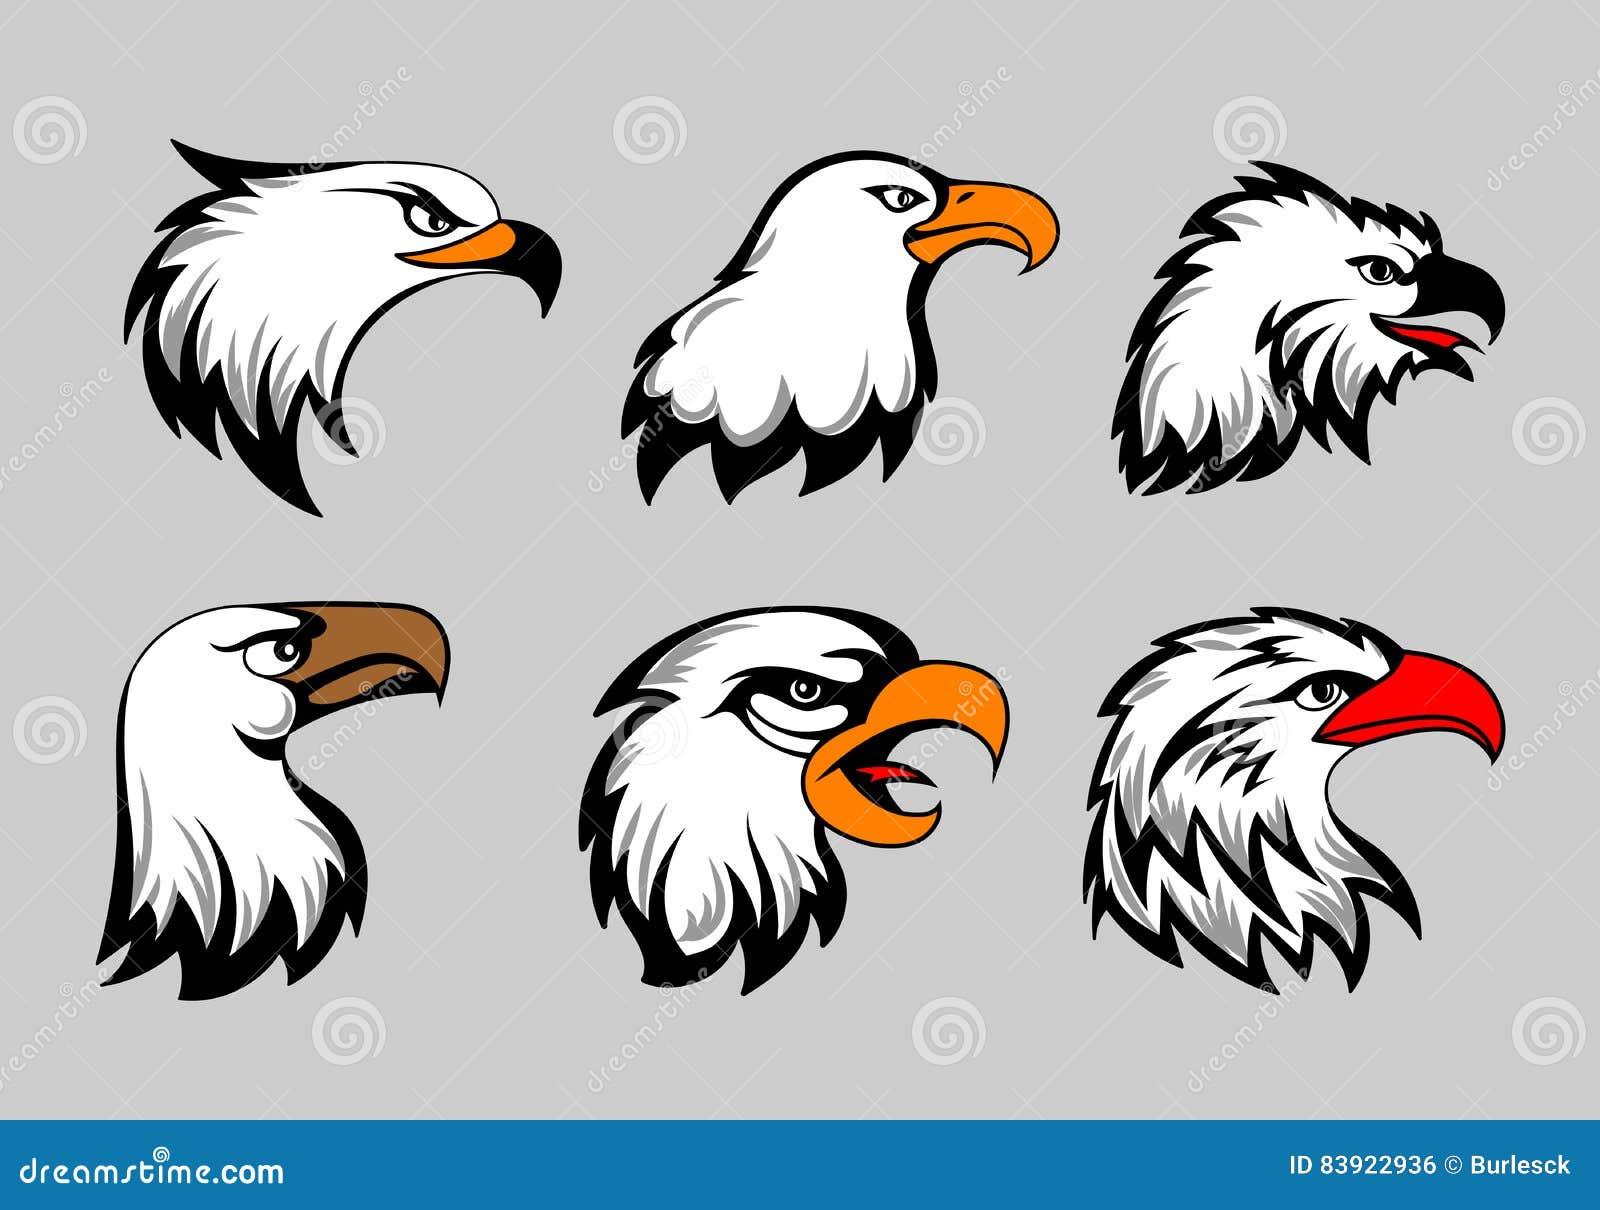 Bald Eagle Mascot Heads Vector Illustration. American Eagles Head ...